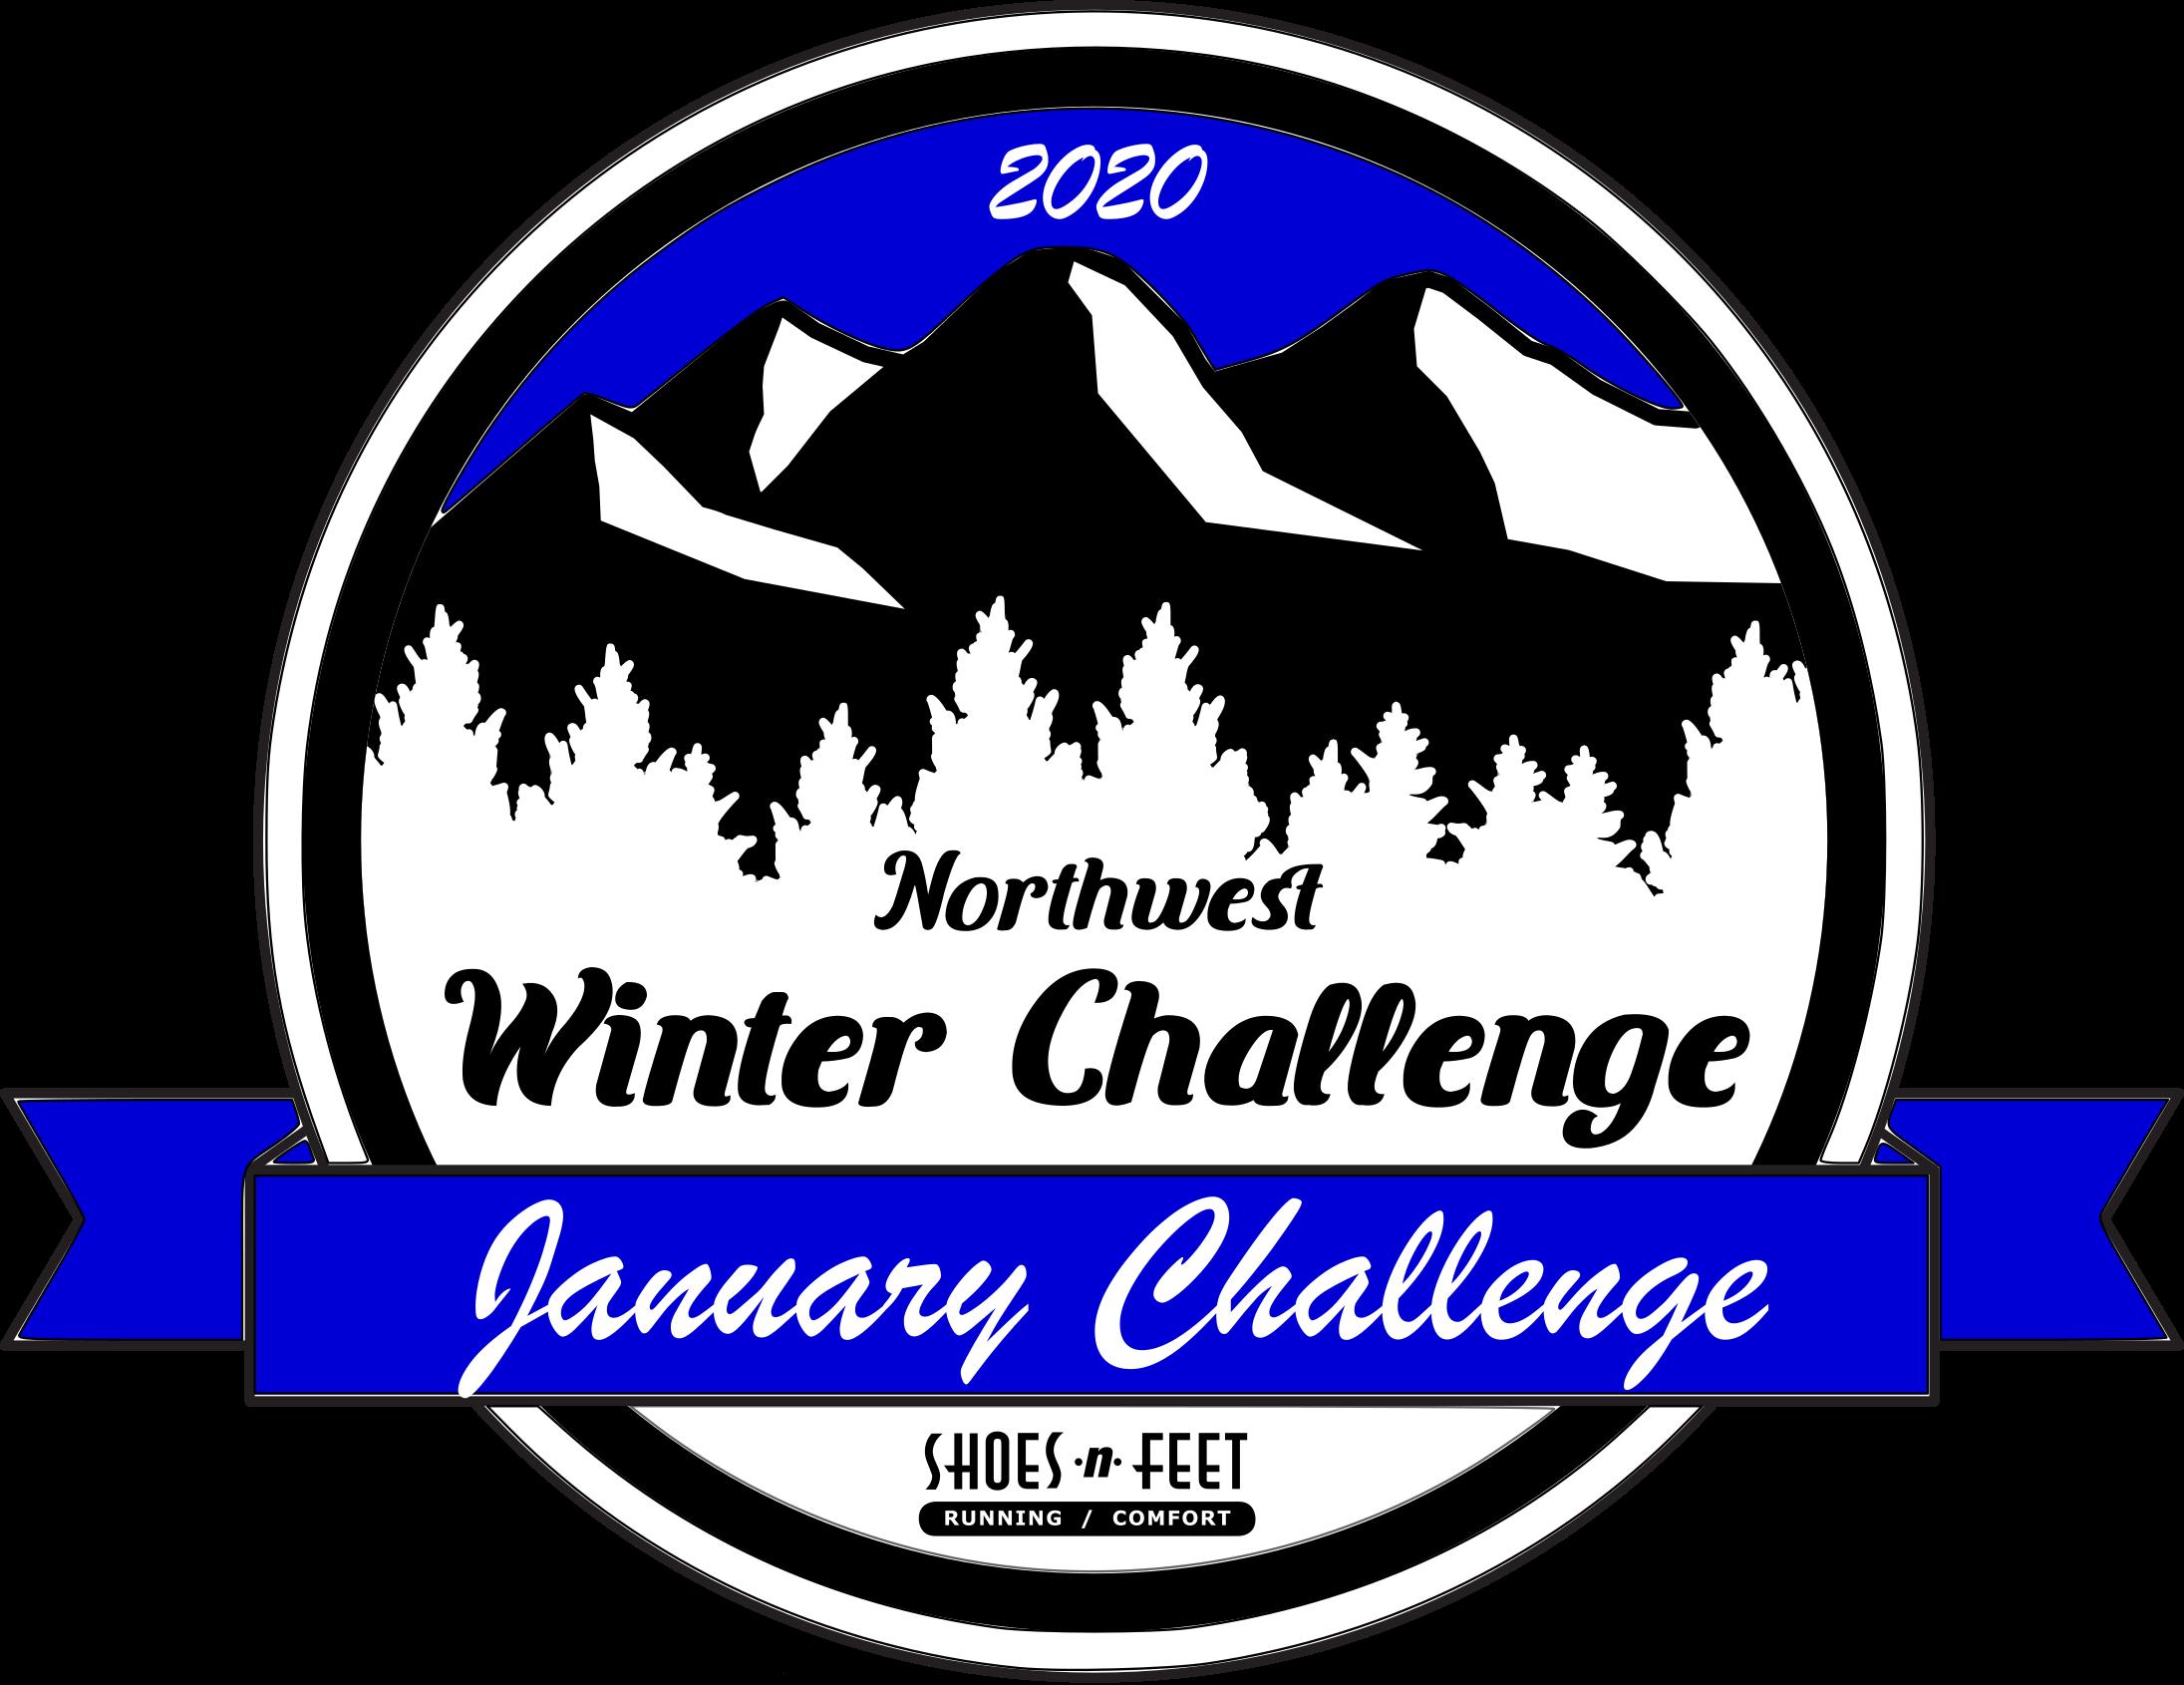 2020 january challenge logo